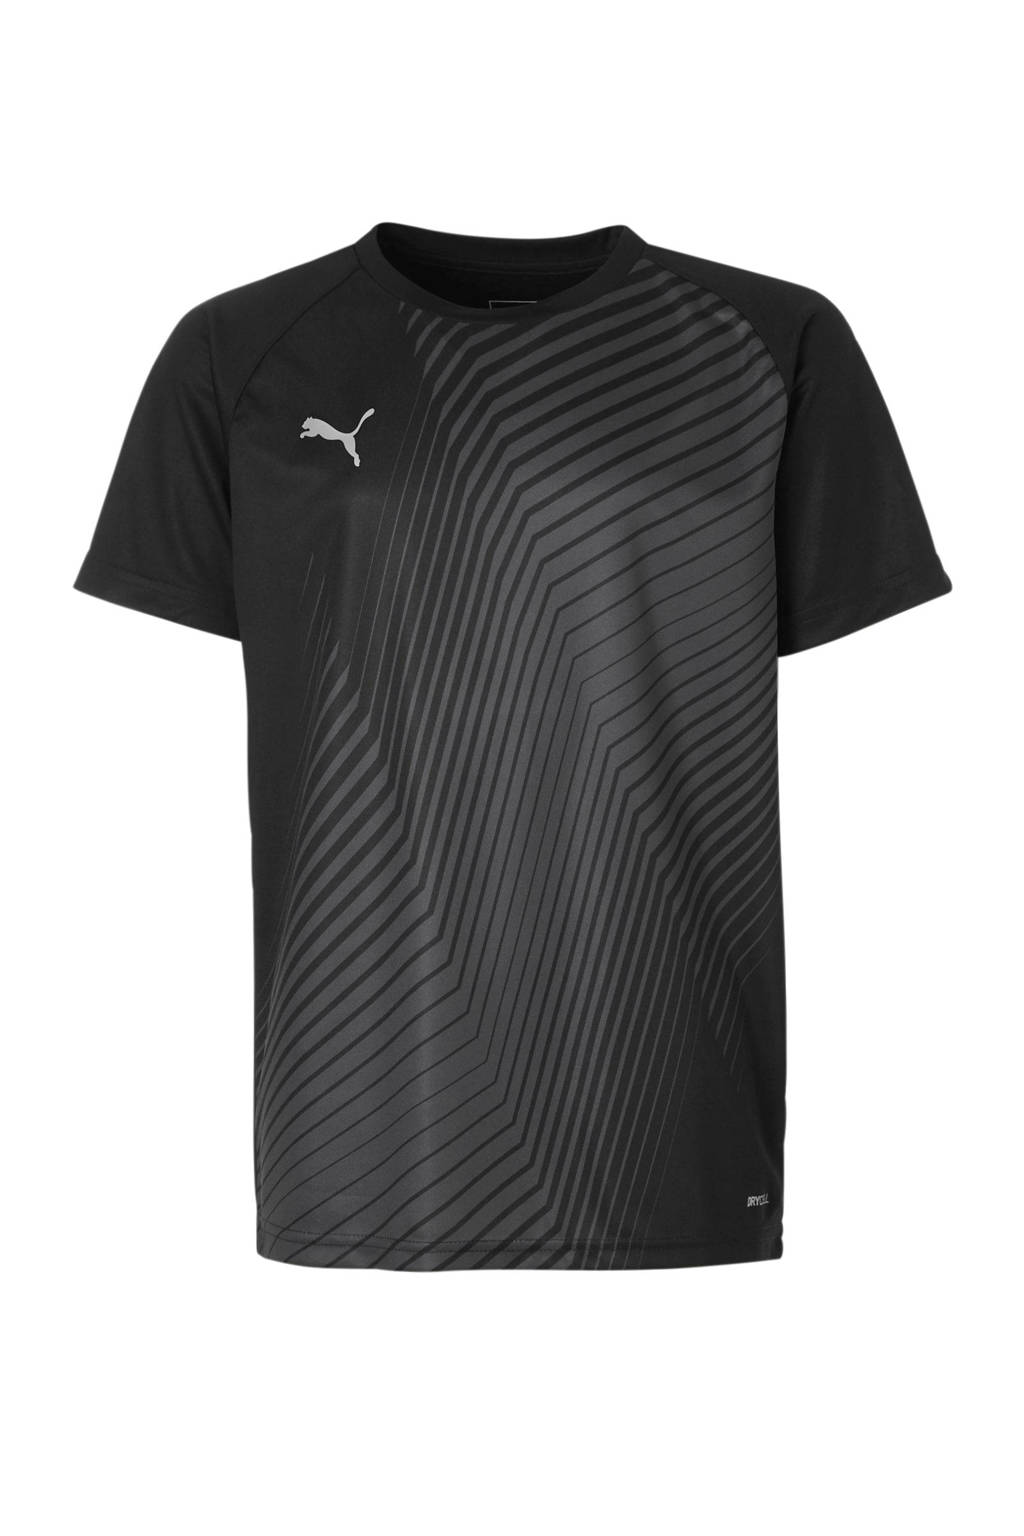 Puma Junior  voetbalshirt zwart, Zwart